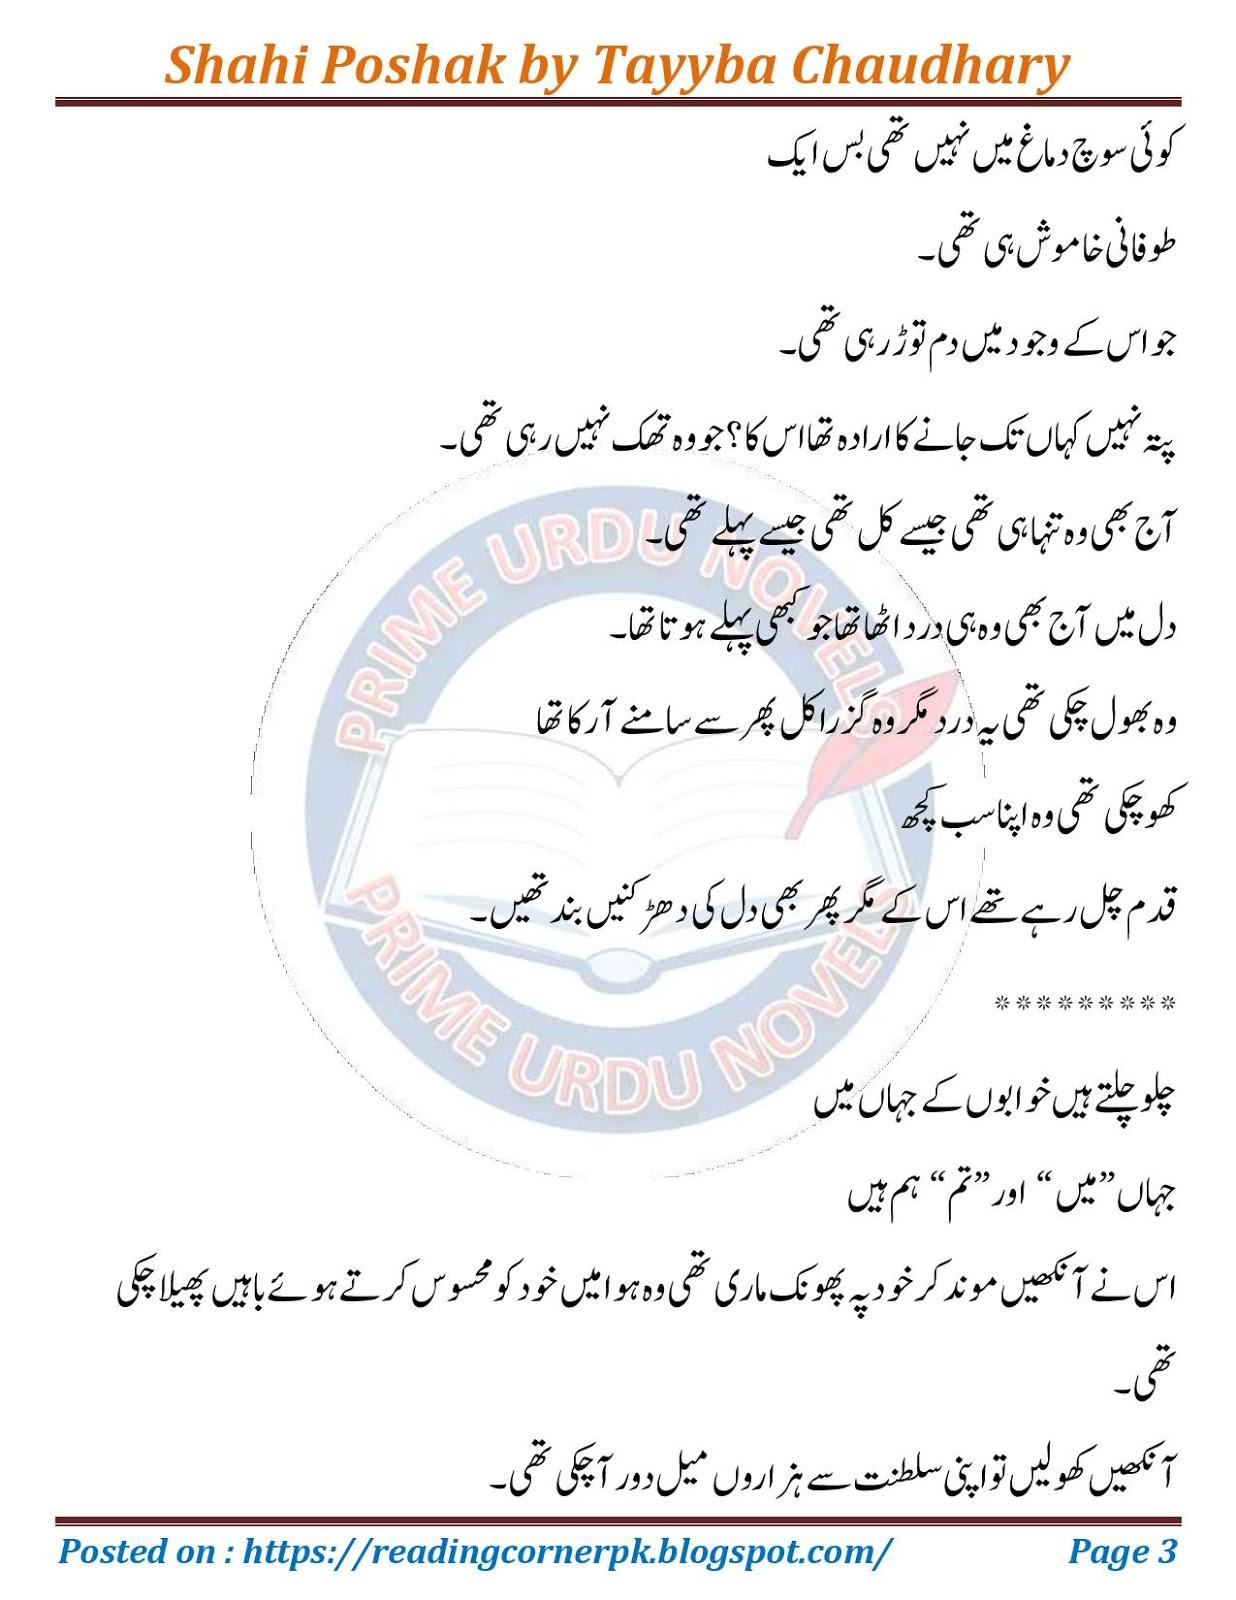 Shahi Poshak By Tayyba Chaudhary Fantasy Based Urdu Novel